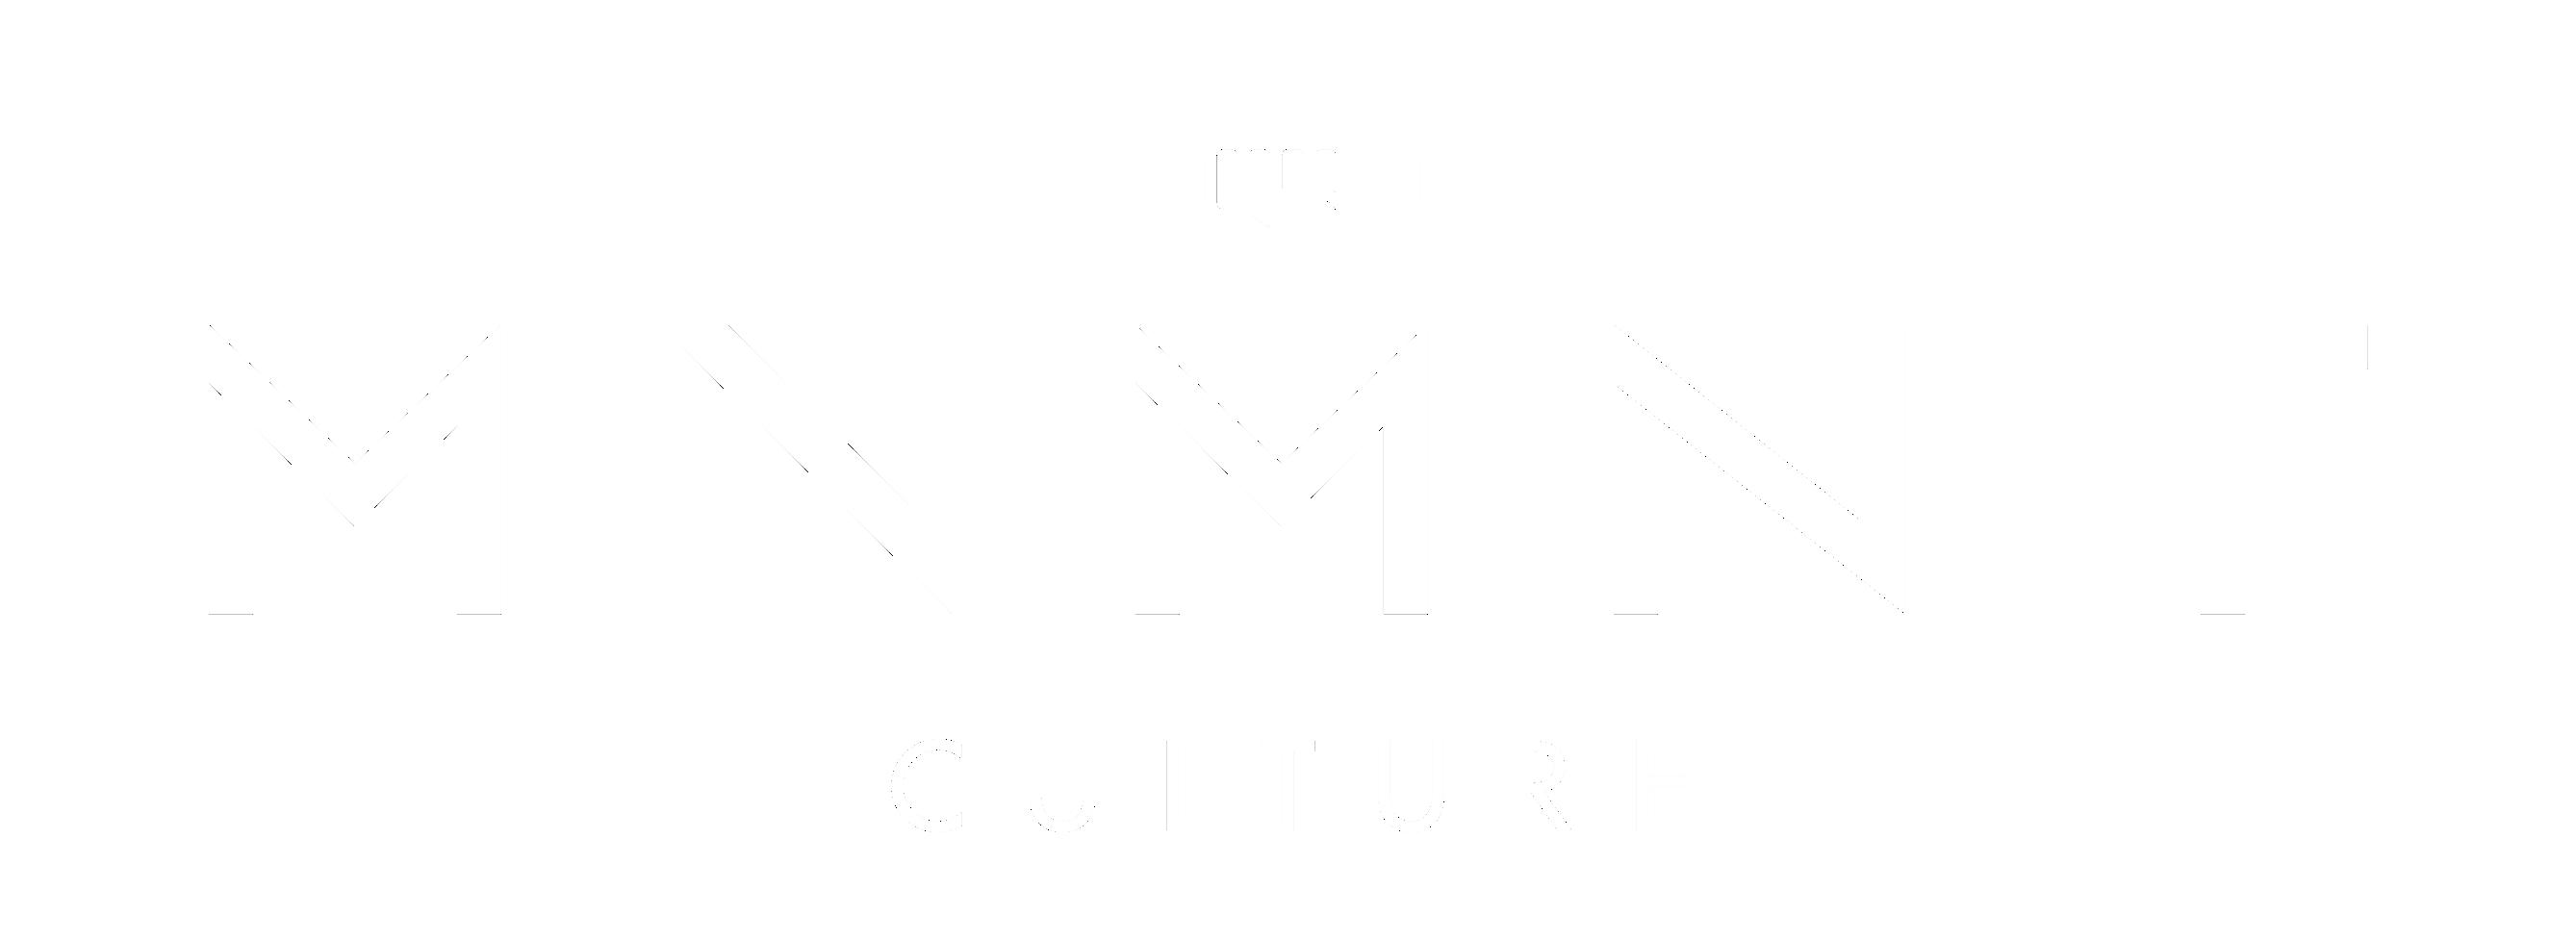 Design a Unique Minimal/ICONIC logo for clothing label MVEMNT CULTURE